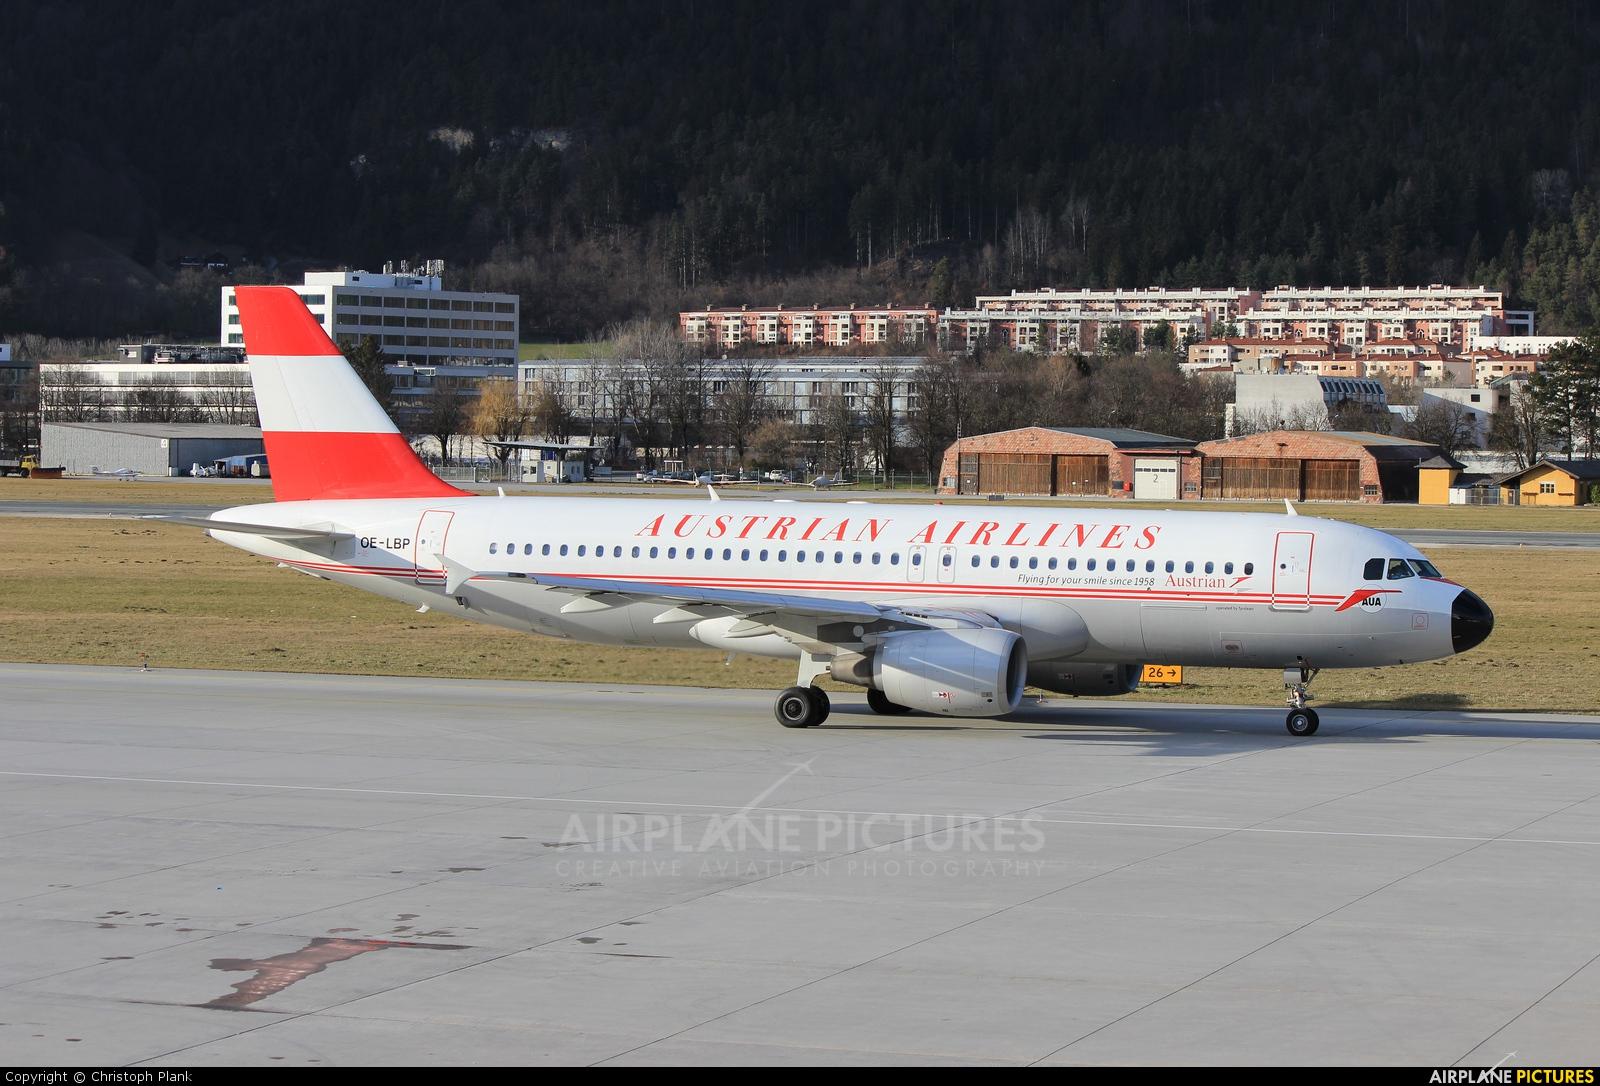 Austrian Airlines/Arrows/Tyrolean OE-LBP aircraft at Innsbruck